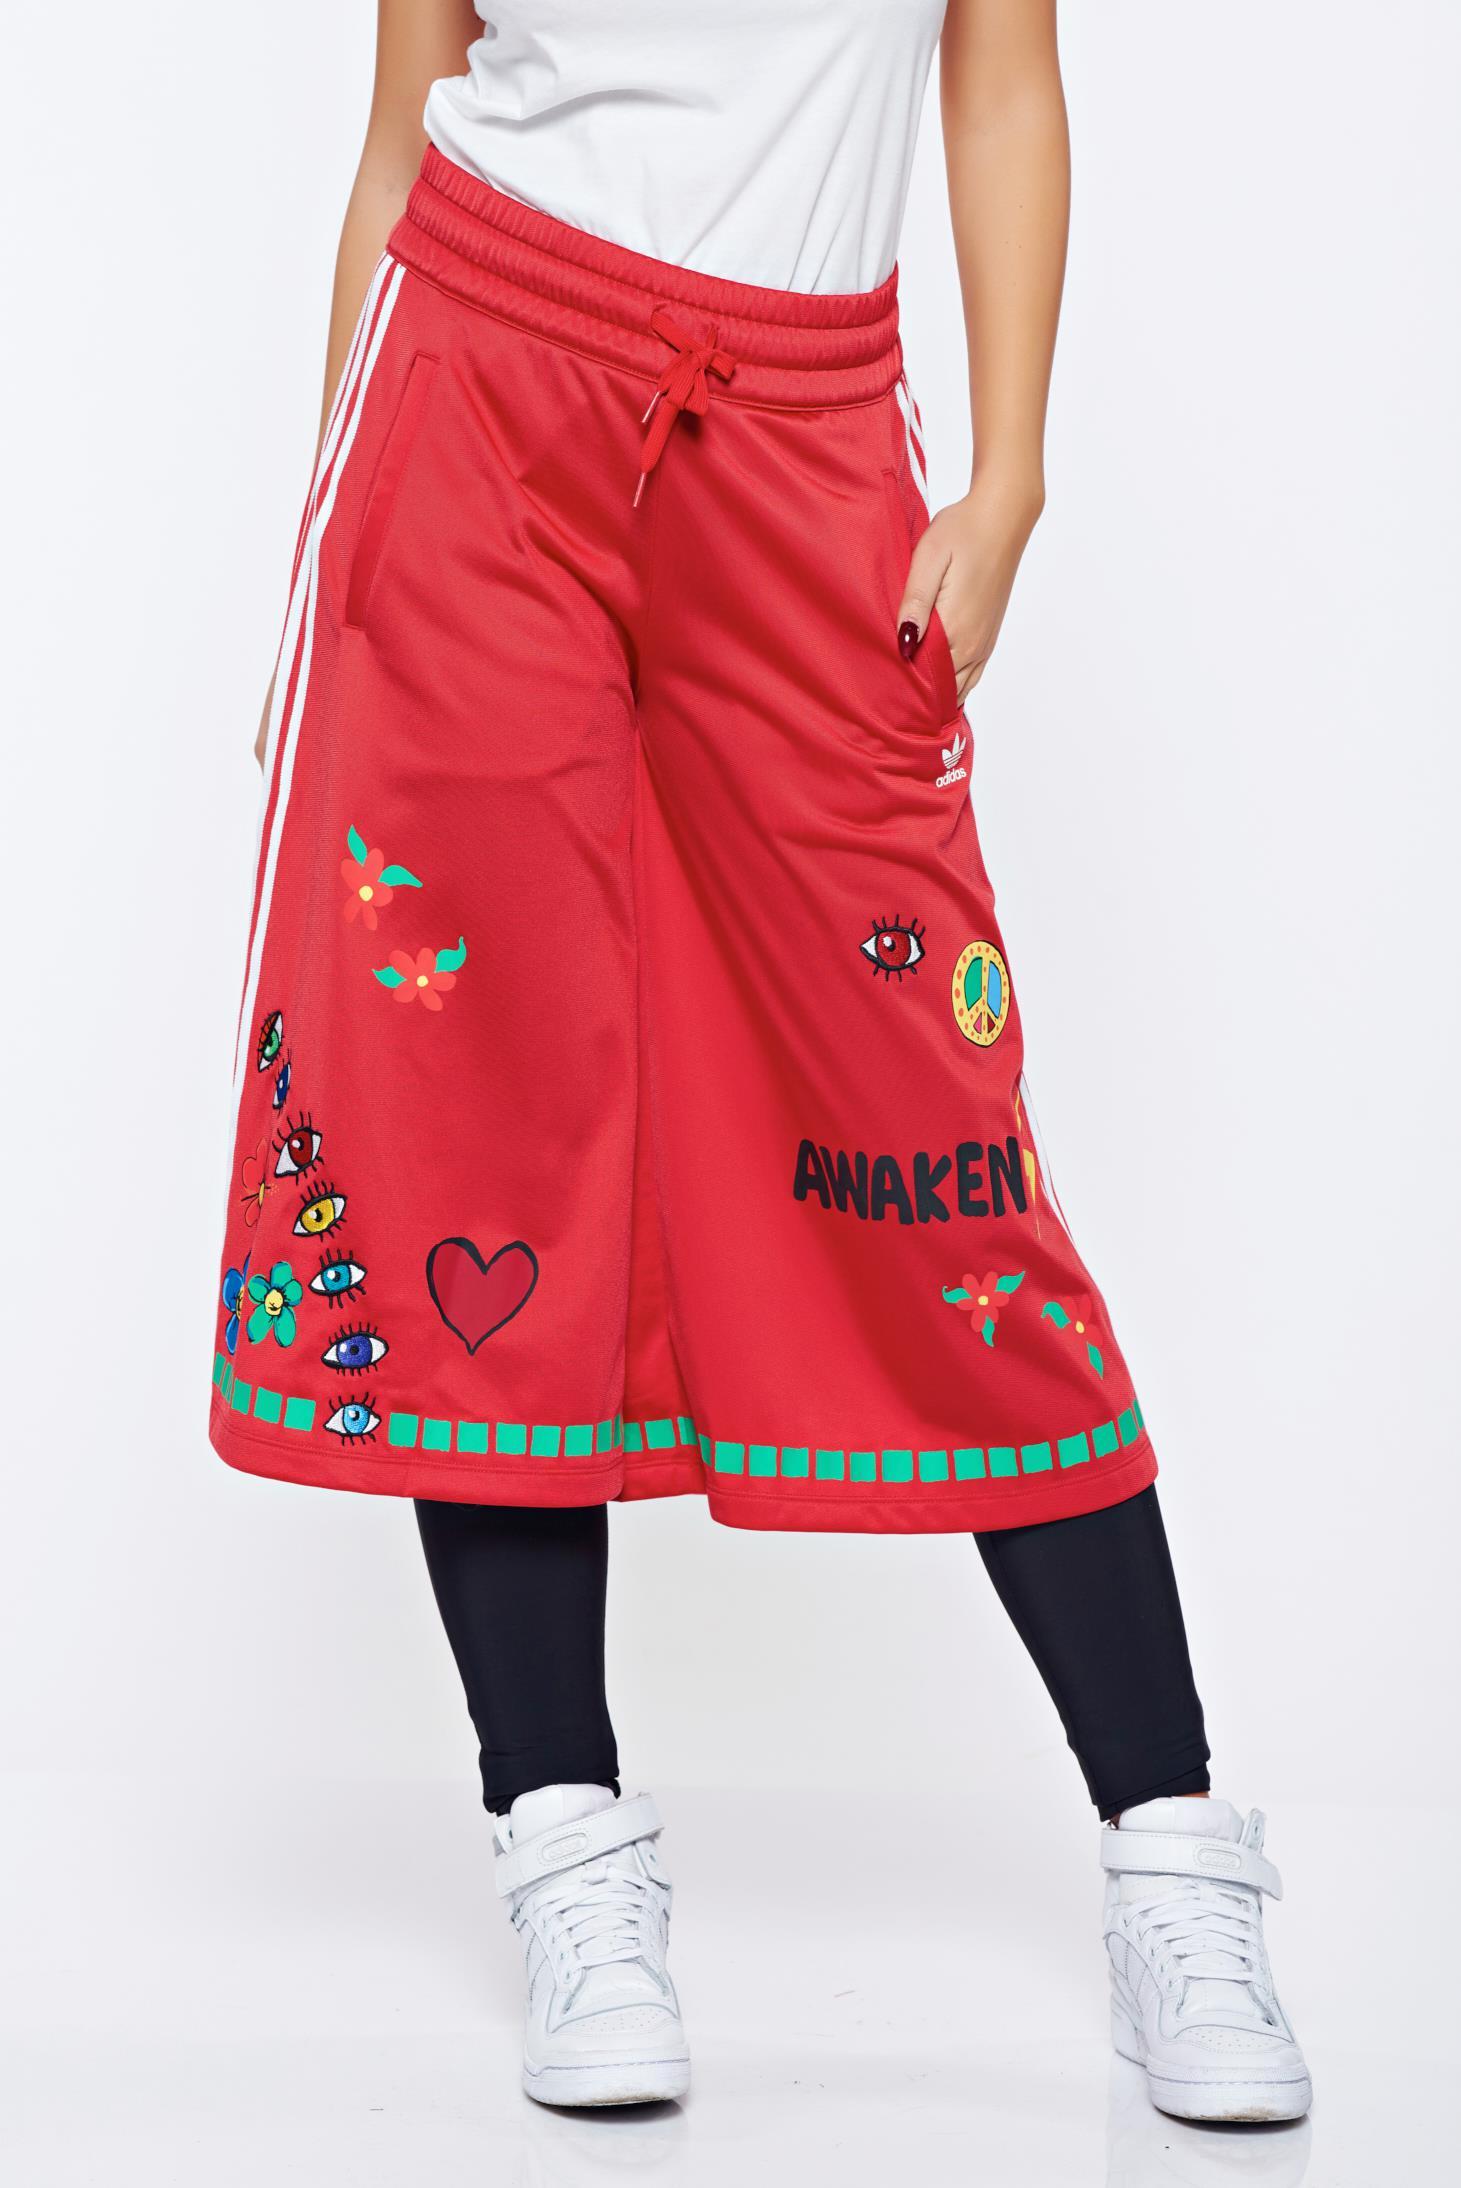 Pantaloni Adidas rosii sport brodati cu croi larg cu elastic in talie